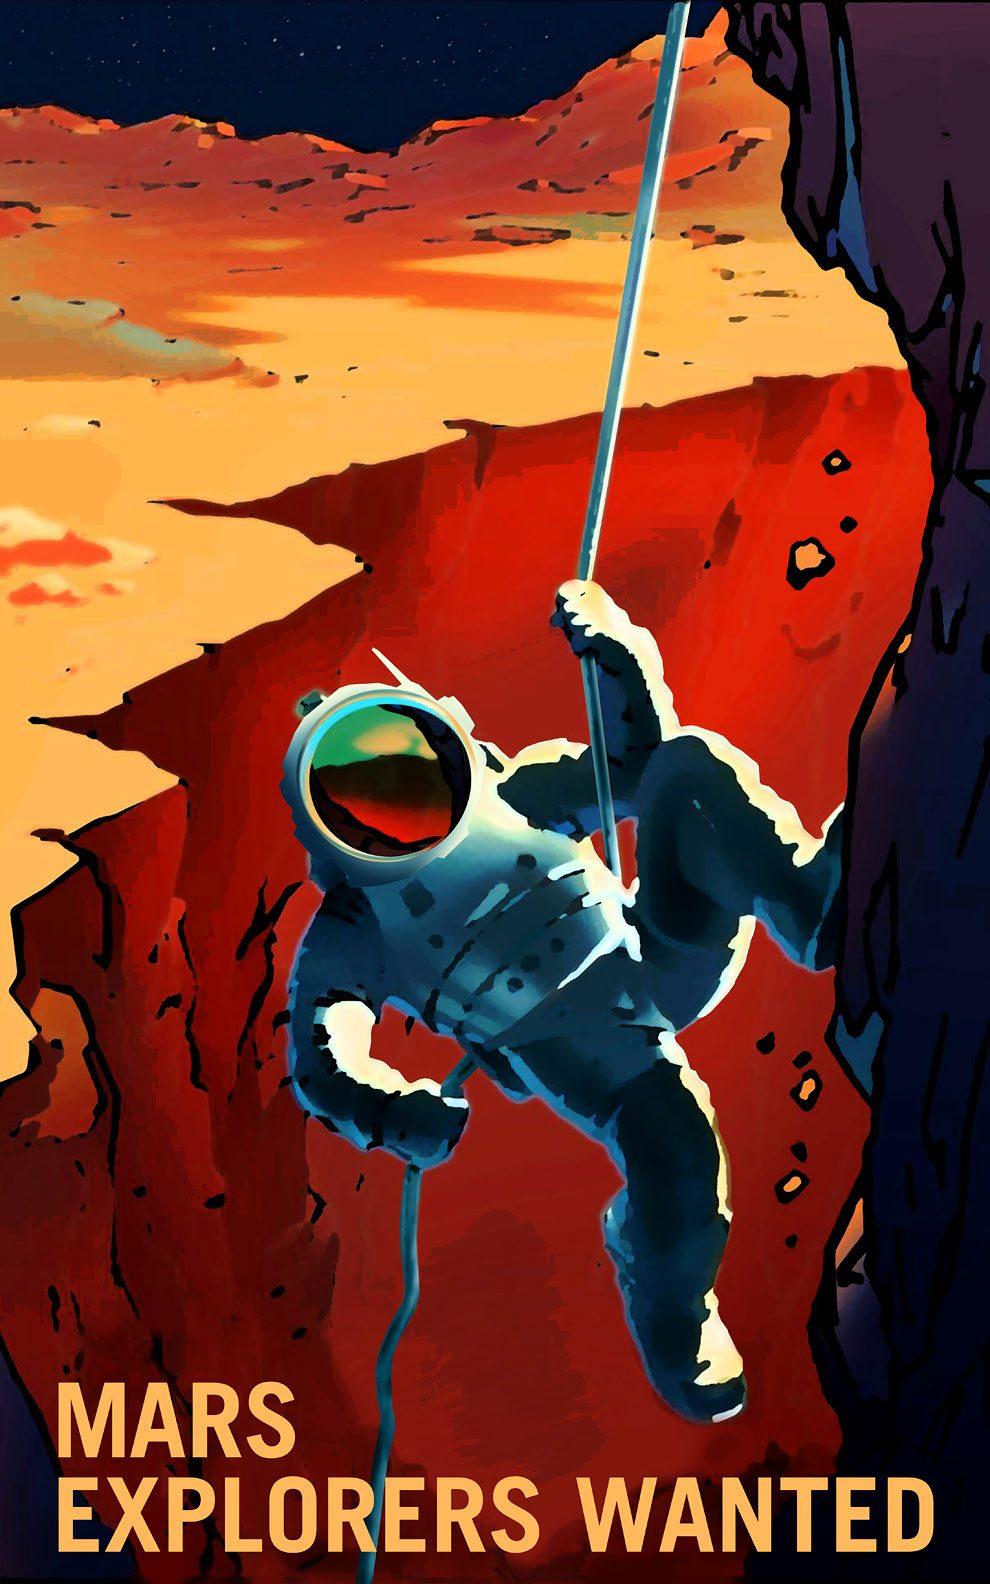 P01-Explorers-Wanted-NASA-Recruitment-Poster